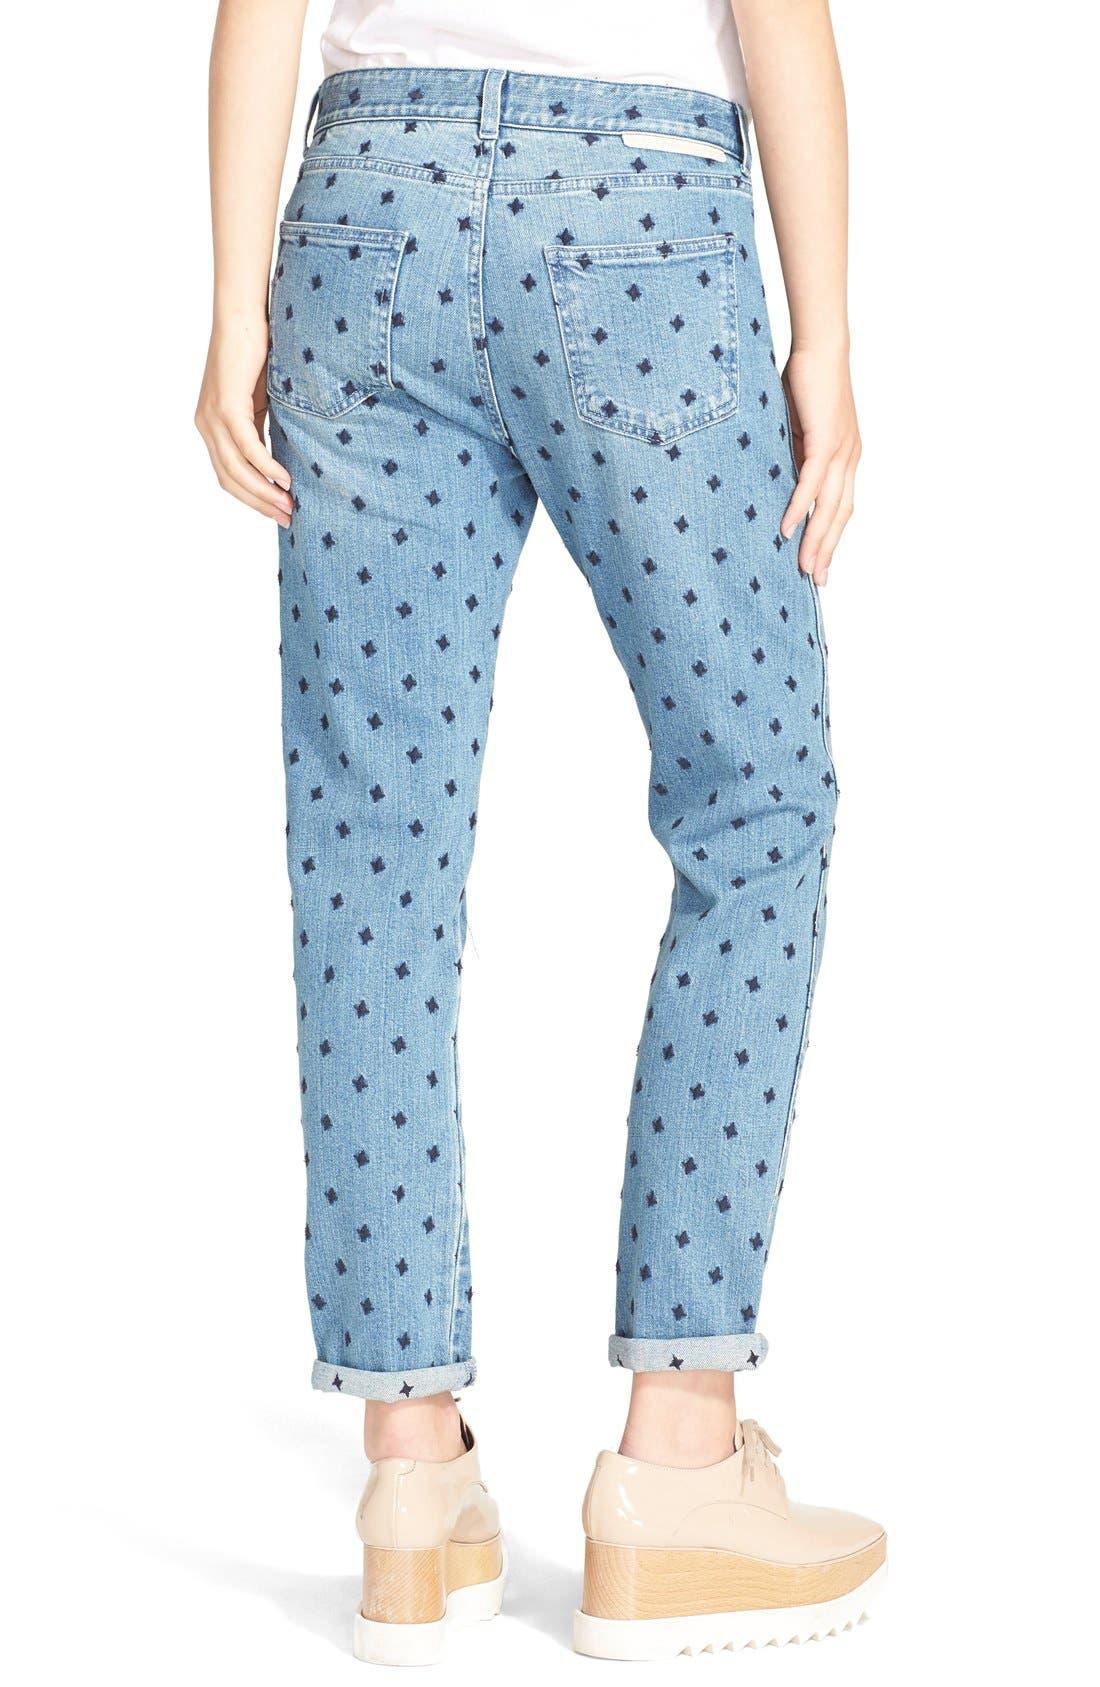 Alternate Image 2  - Stella McCartney 'The Skinny' Star Embroidered Boyfriend Jeans (Classic Blue)